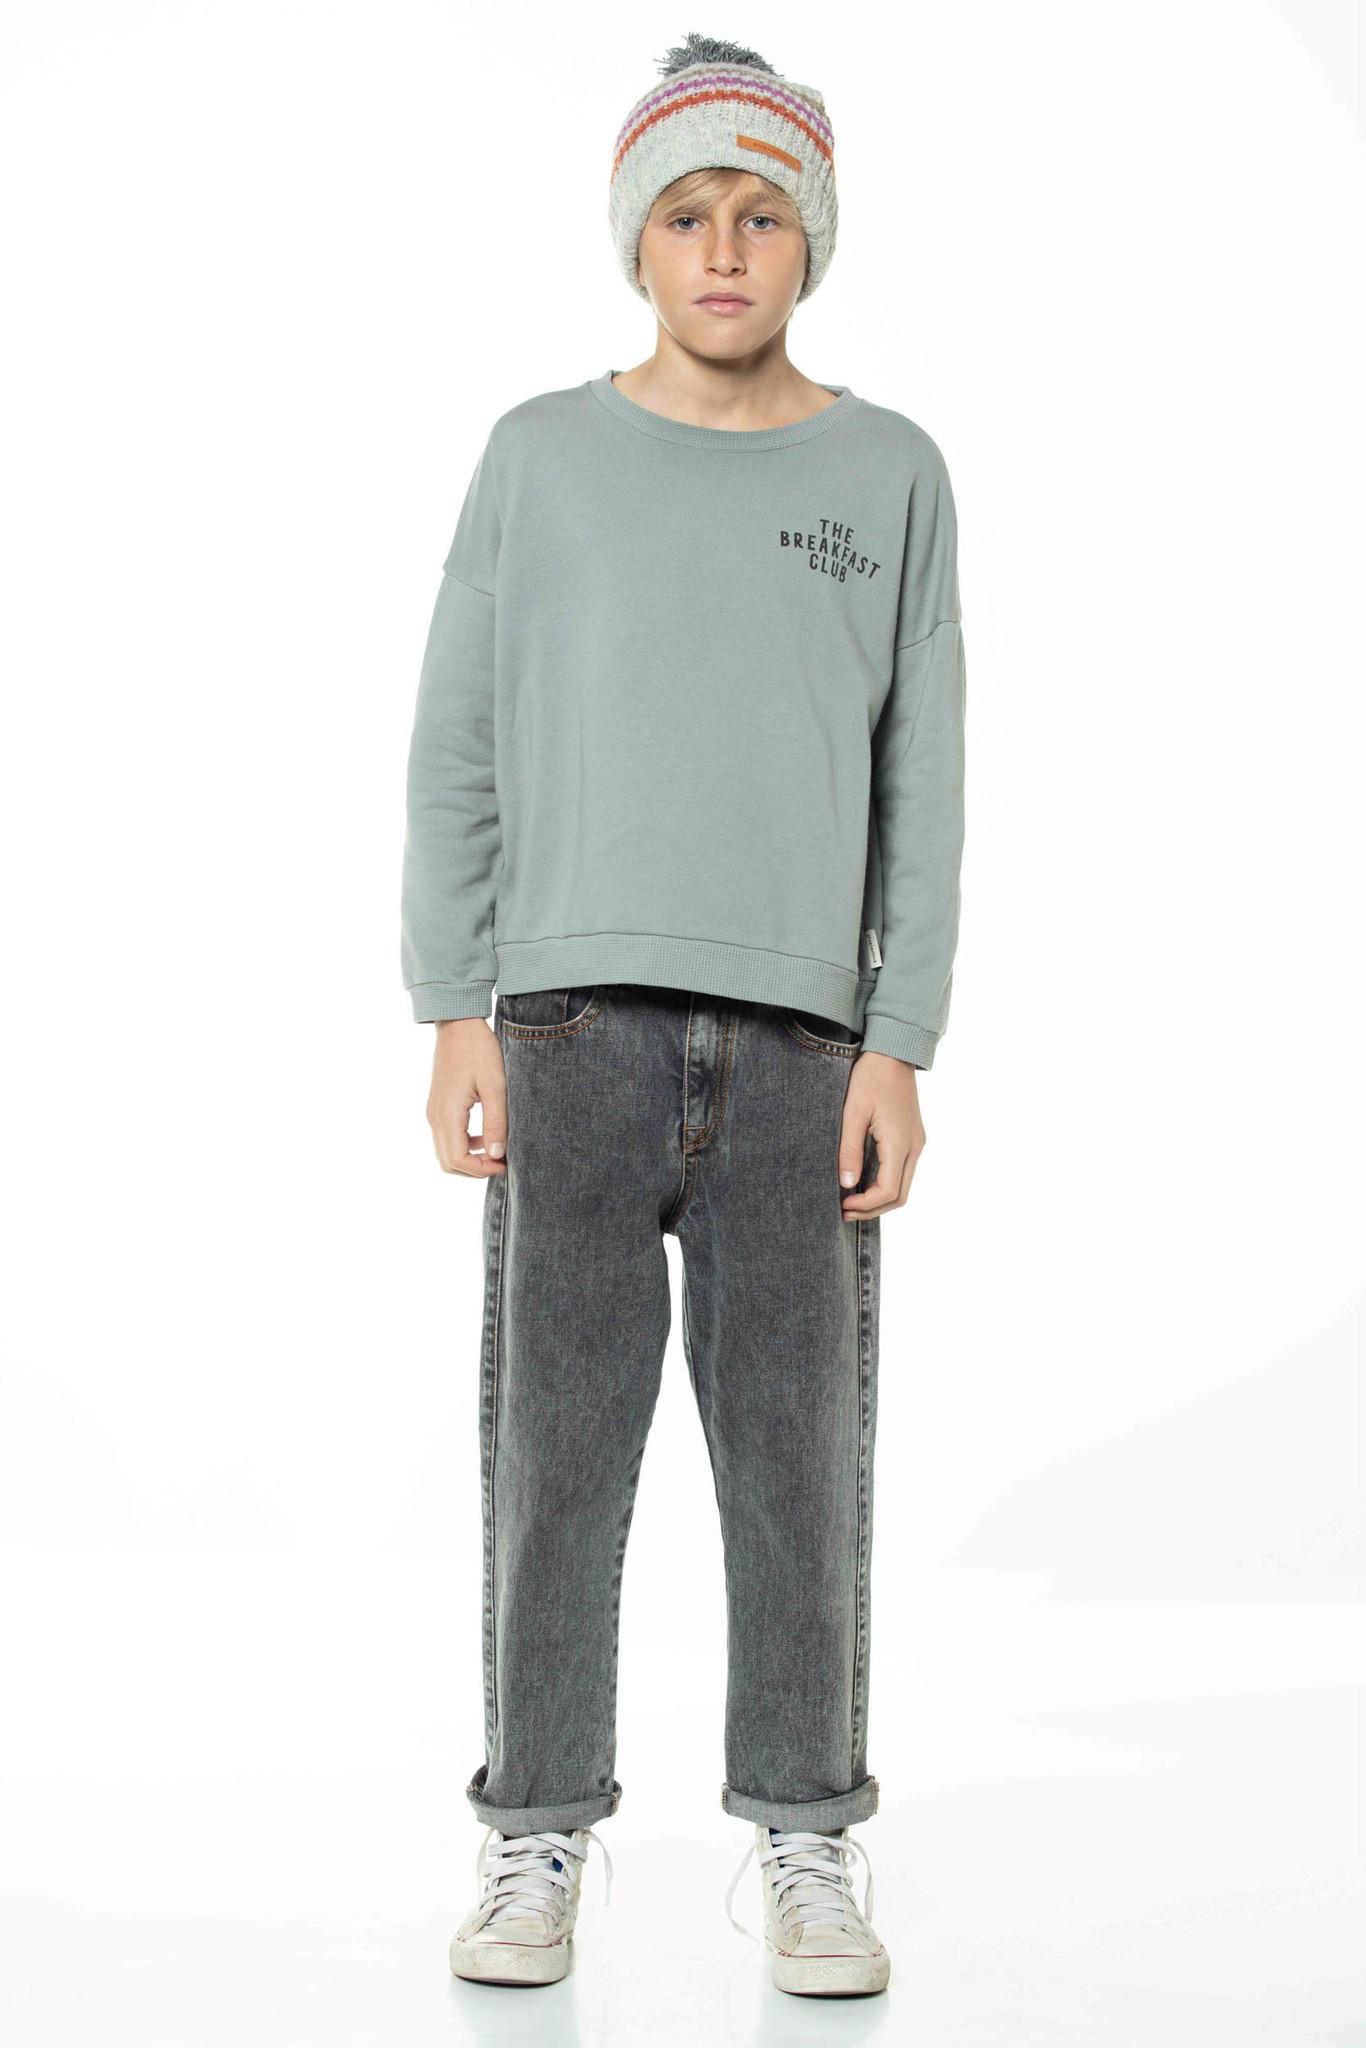 piupiuchick Unisex sweatshirt   grey w/ cereal box print